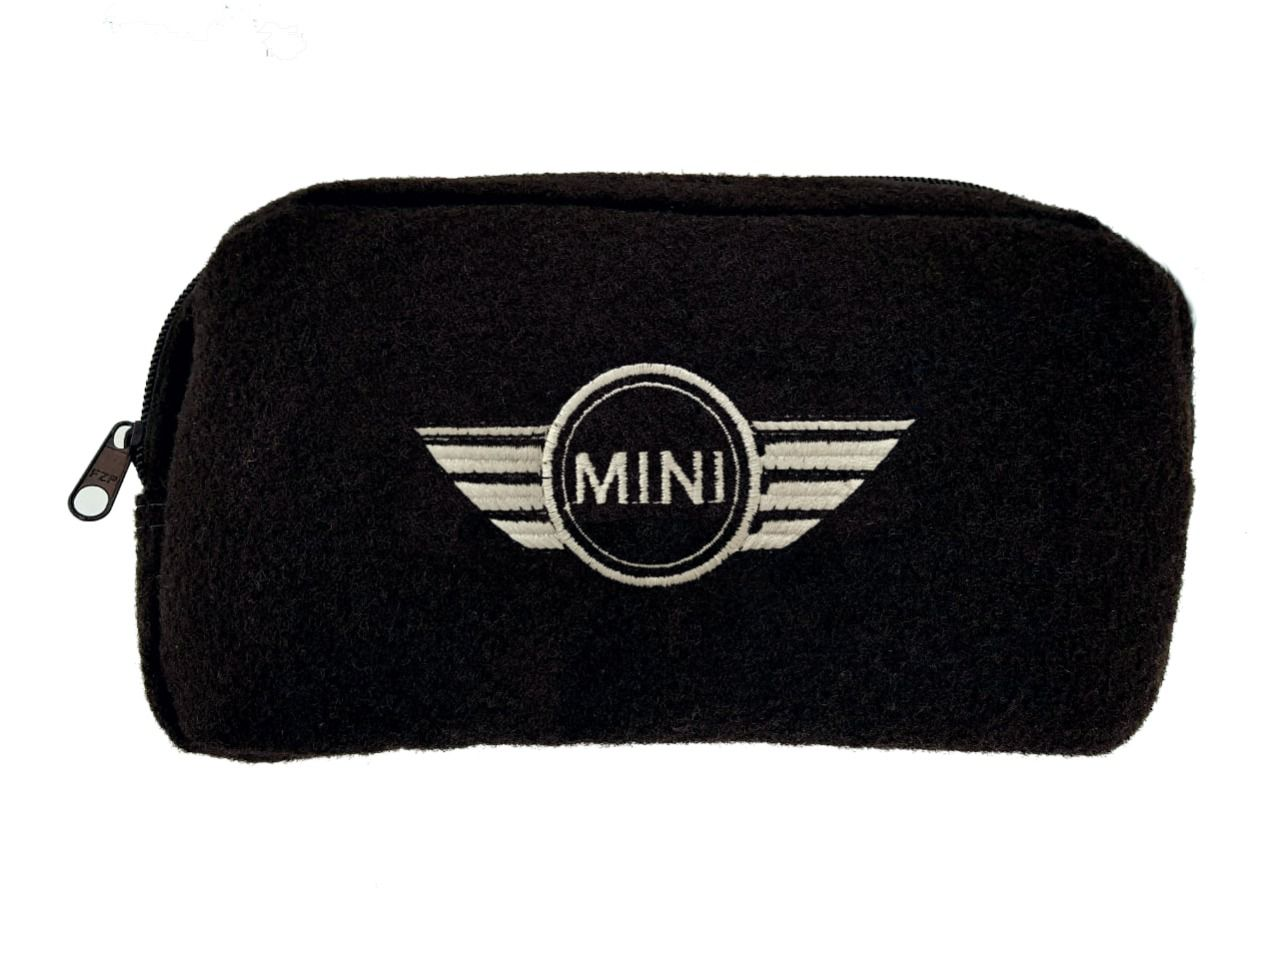 Kit Bolsa Organizadora Porta Malas e Necessaire Porta Luvas Mini Cooper